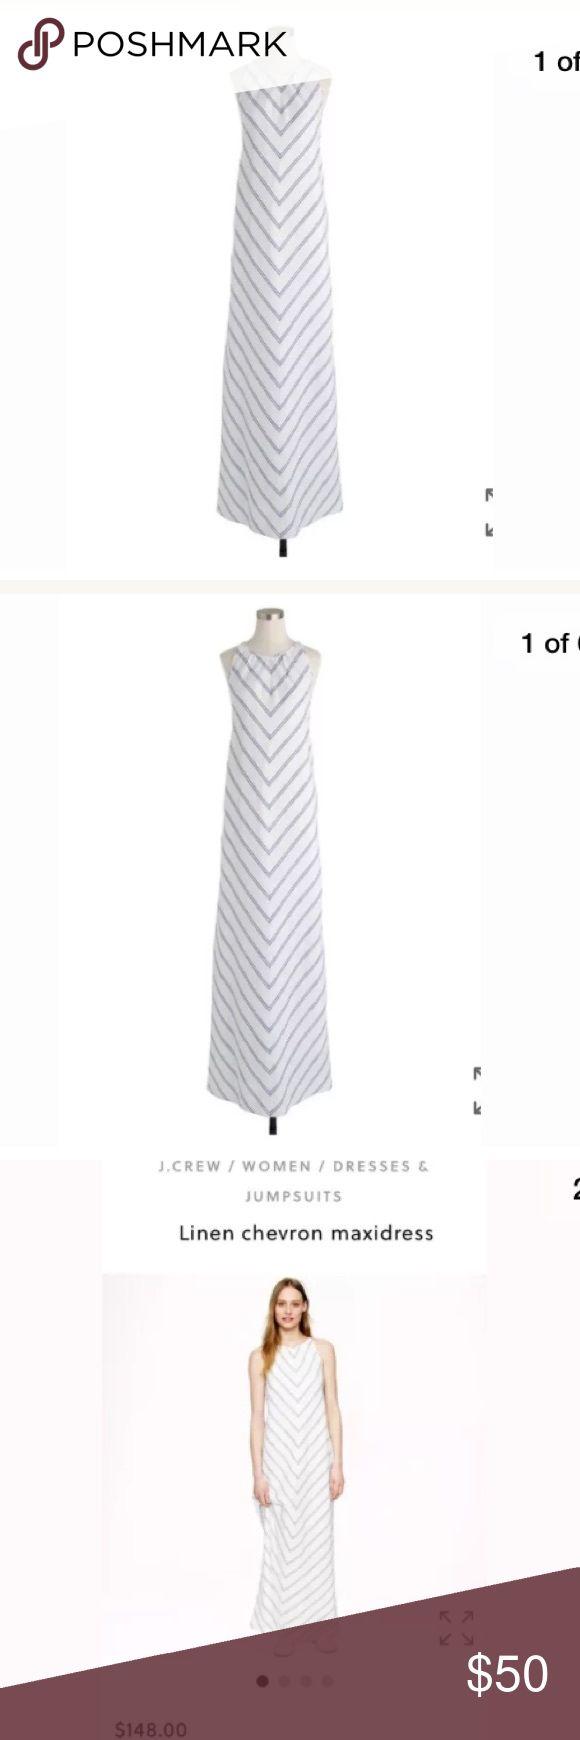 NWT J Crew Linen Chevron Maxi Dress  Sz 00 XS New With Tags J Crew Linen Chevron blue and white maxi dress. Size 00 XS. $148. J. Crew Dresses Maxi